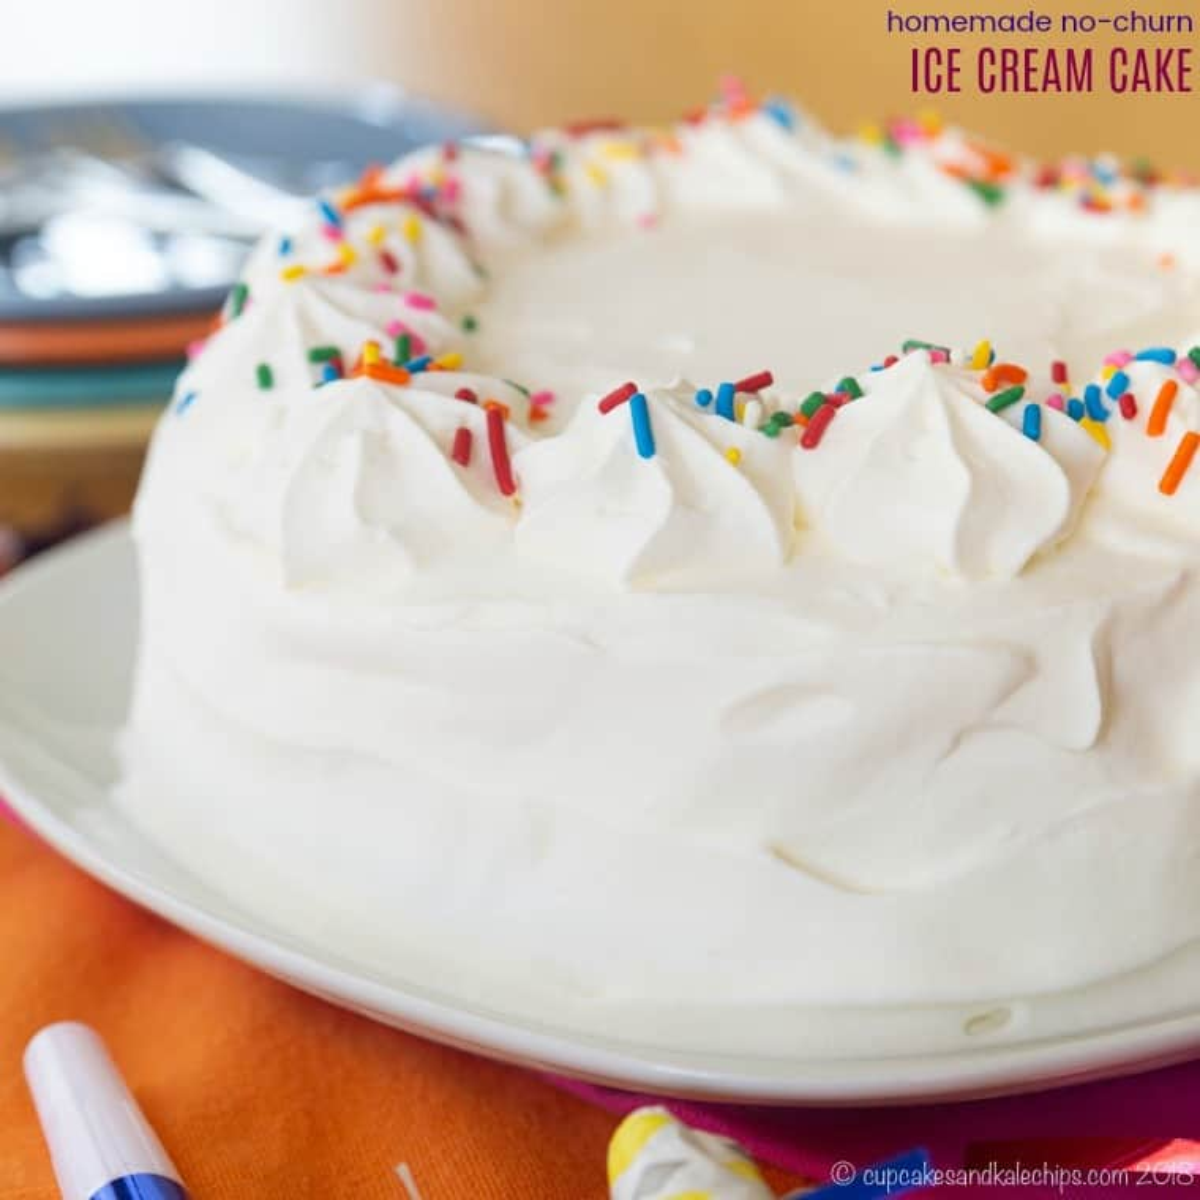 Easy Homemade Ice Cream Cake Recipe - Cupcakes & Kale Chips